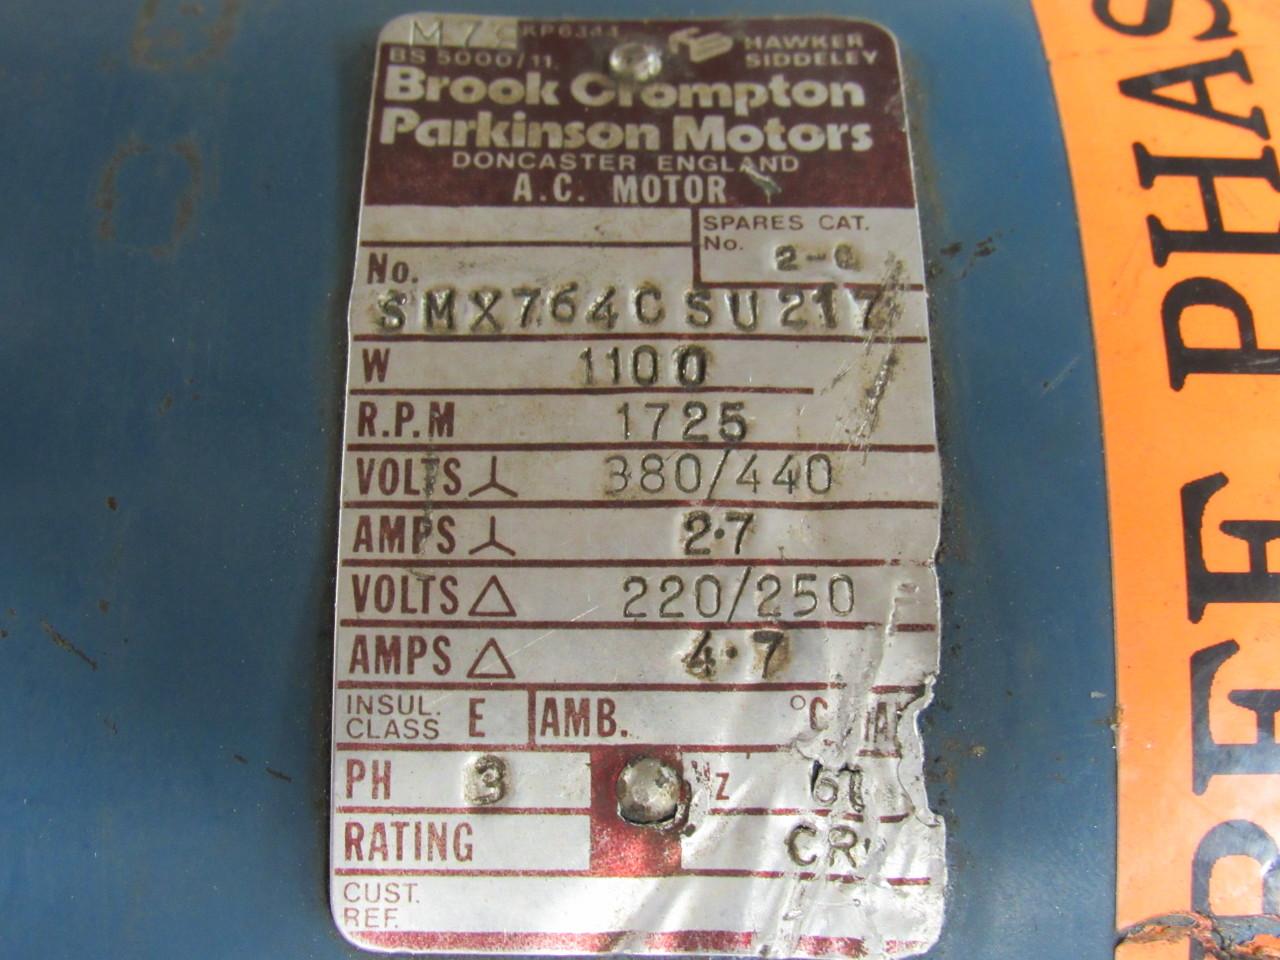 Brook crompton parkinson motors wiring diagrams class diagram parkinson motors impremedianet 128608 brook crompton smx764csu217 3 phase ac motor wye delta 1725 rpm 1 swarovskicordoba Image collections